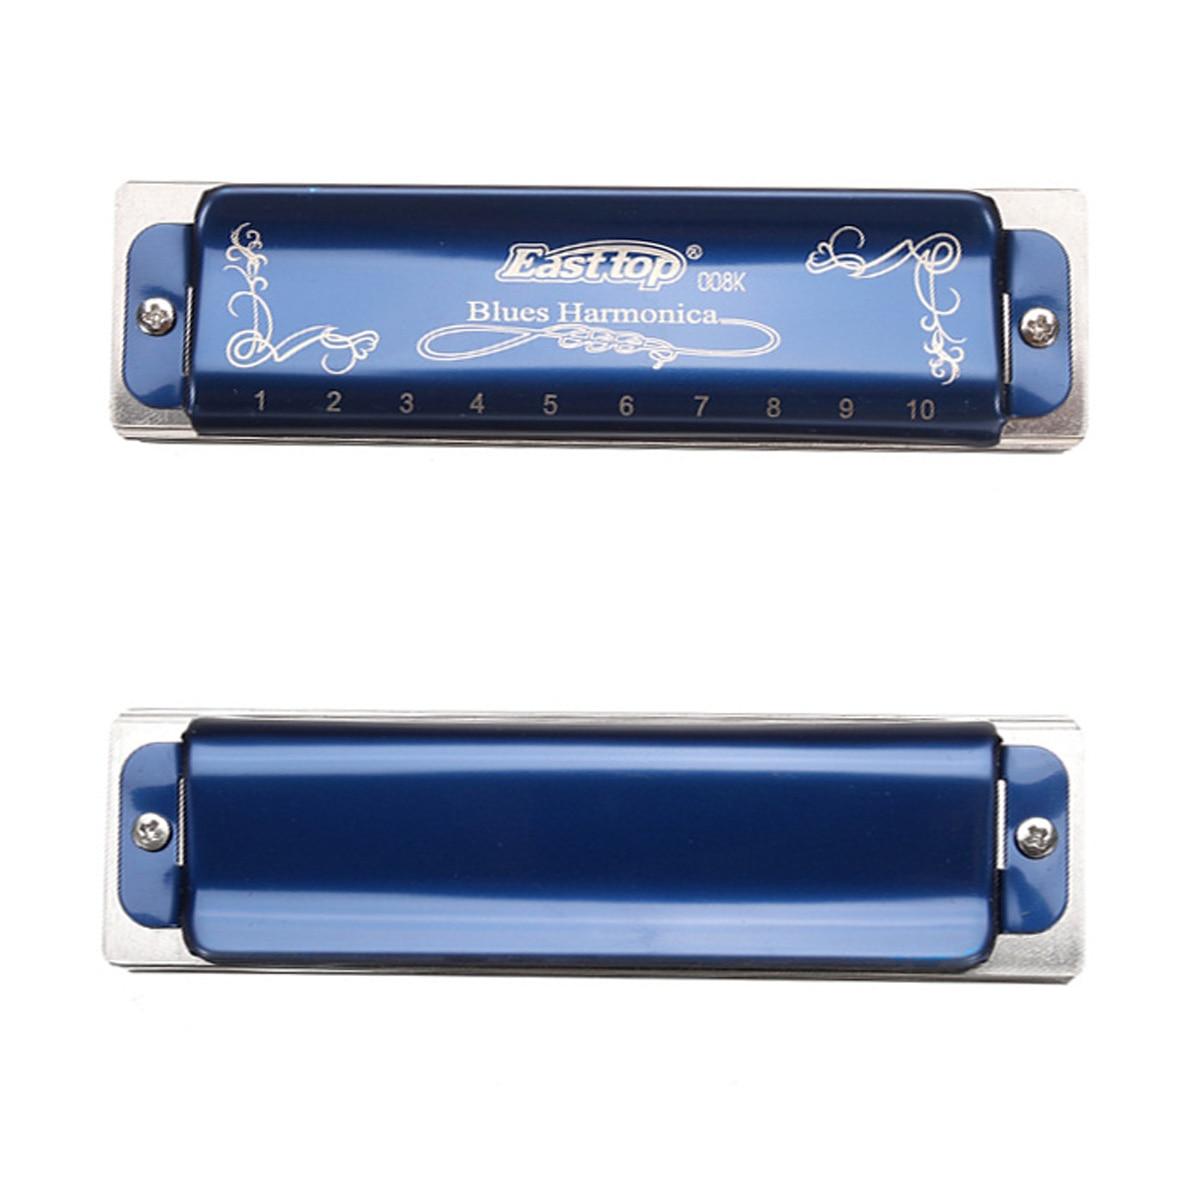 Easttop T008K 10 Holes Blues Harmonica Limited Version Blue Color Diatonic Harp Musical Instrument A B C D E F G Keys With Case